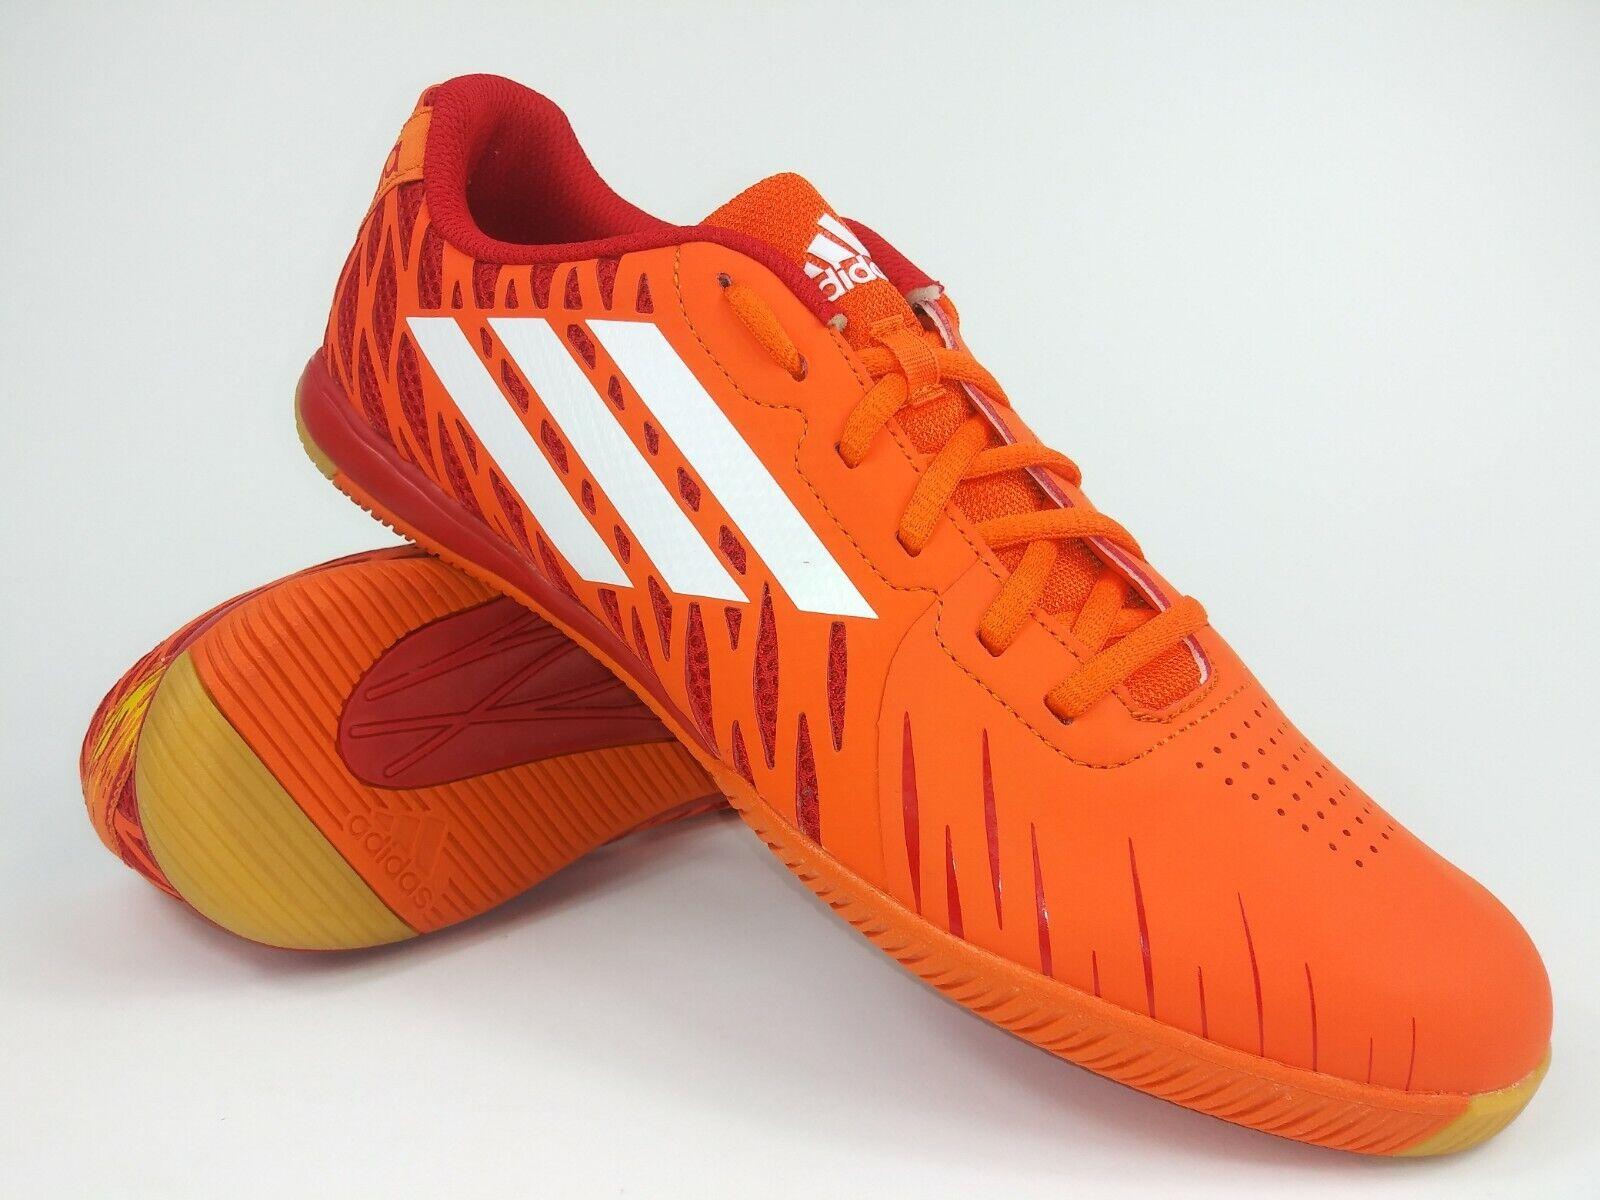 Adidas Mens raros Freefootball truco de velocidad Q21614 naranja fútbol rojo